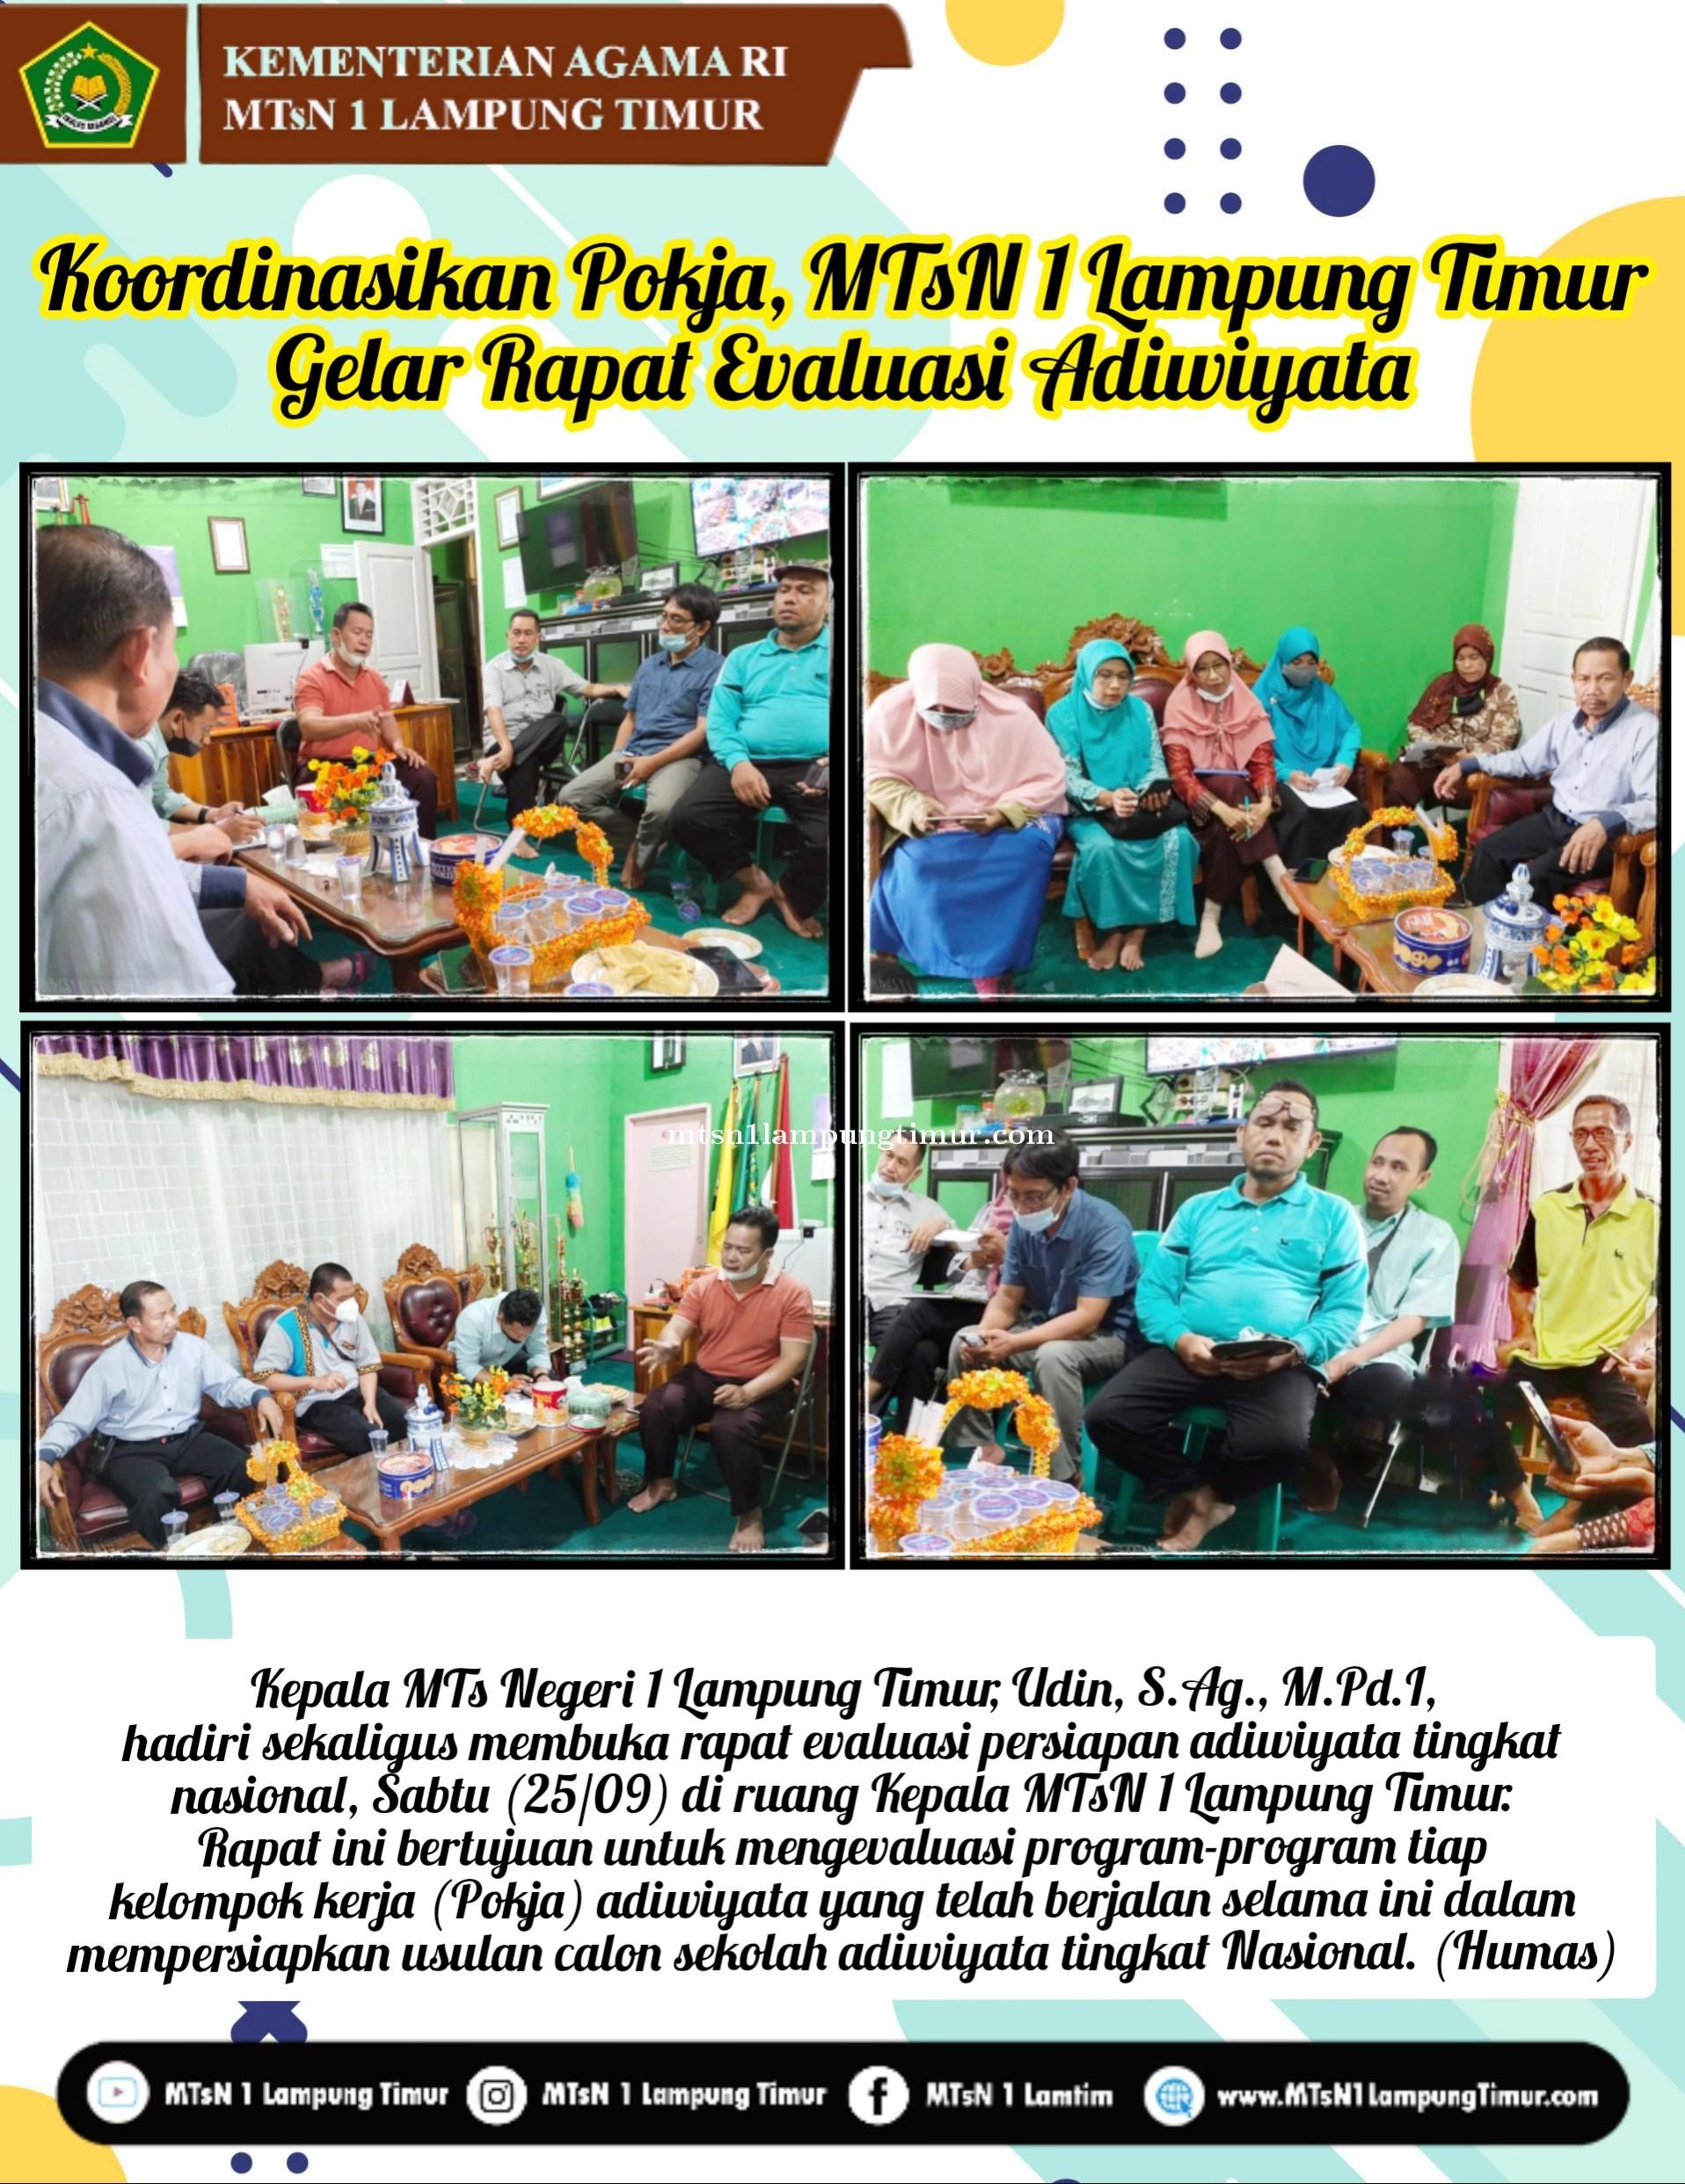 Koordinasikan Pokja, MTsN 1 Lampung Timur  Gelar Rapat Evaluasi Adiwiyata